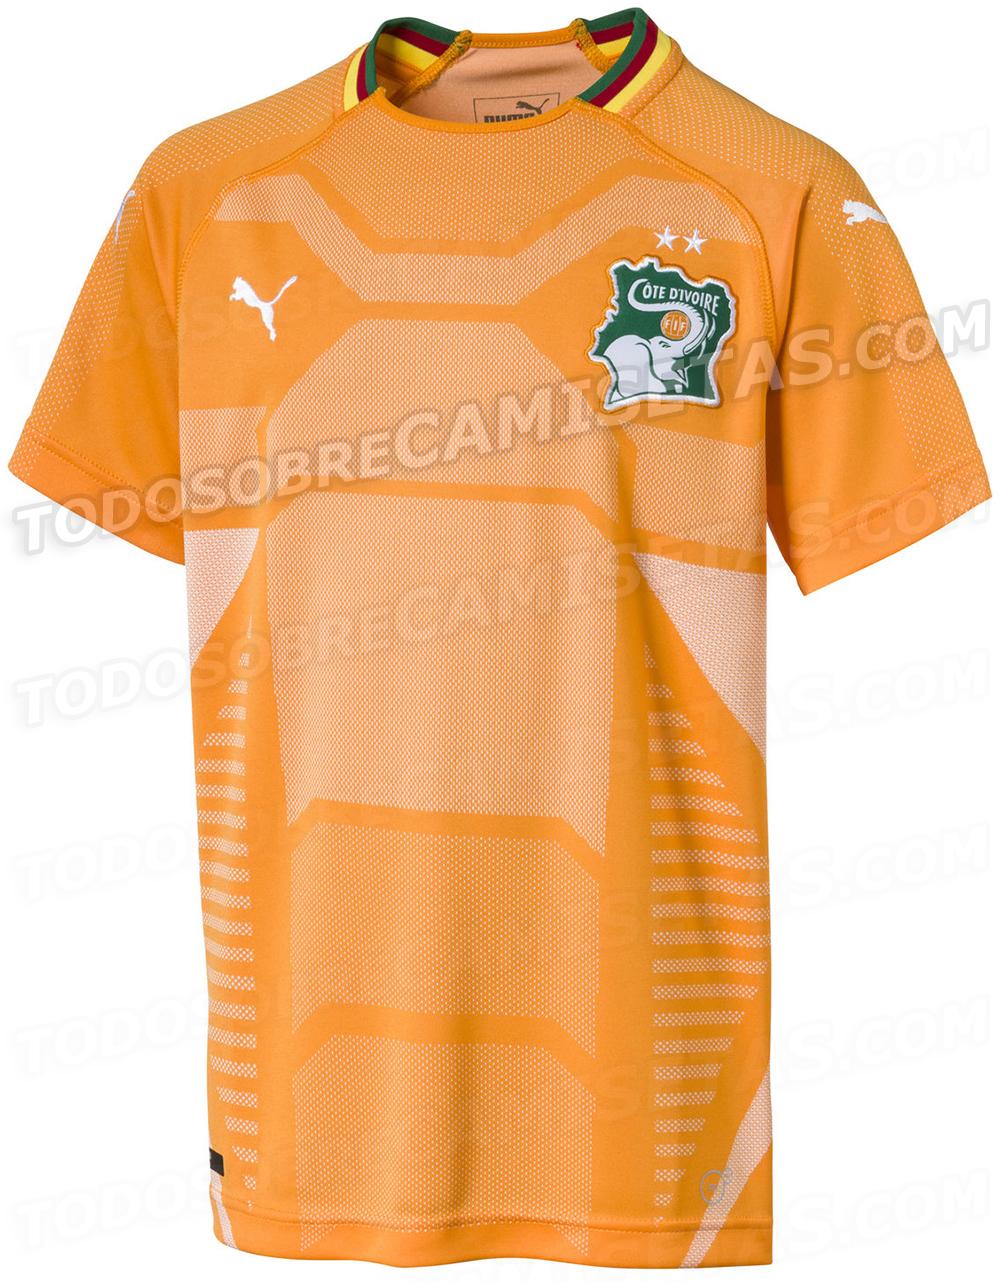 Ivory-Coast-2018-PUMA-new-world-cup-kit-2.jpg